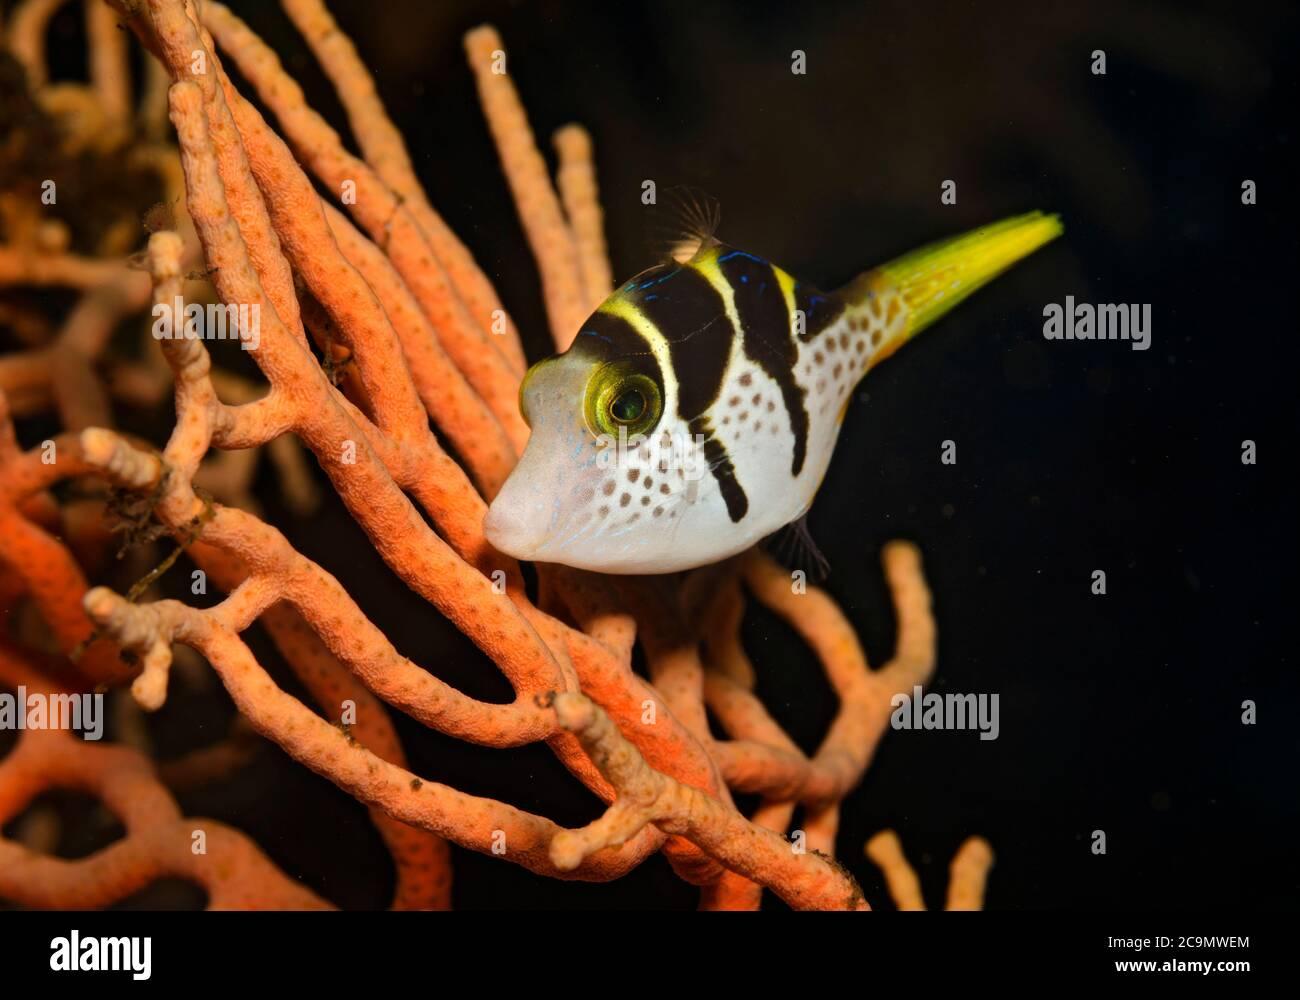 Schwarz-gesattelt Toby, Canthigaster Valentini, am Ventilator Korallen in Tulamben, Bali, Indonesien Stockfoto